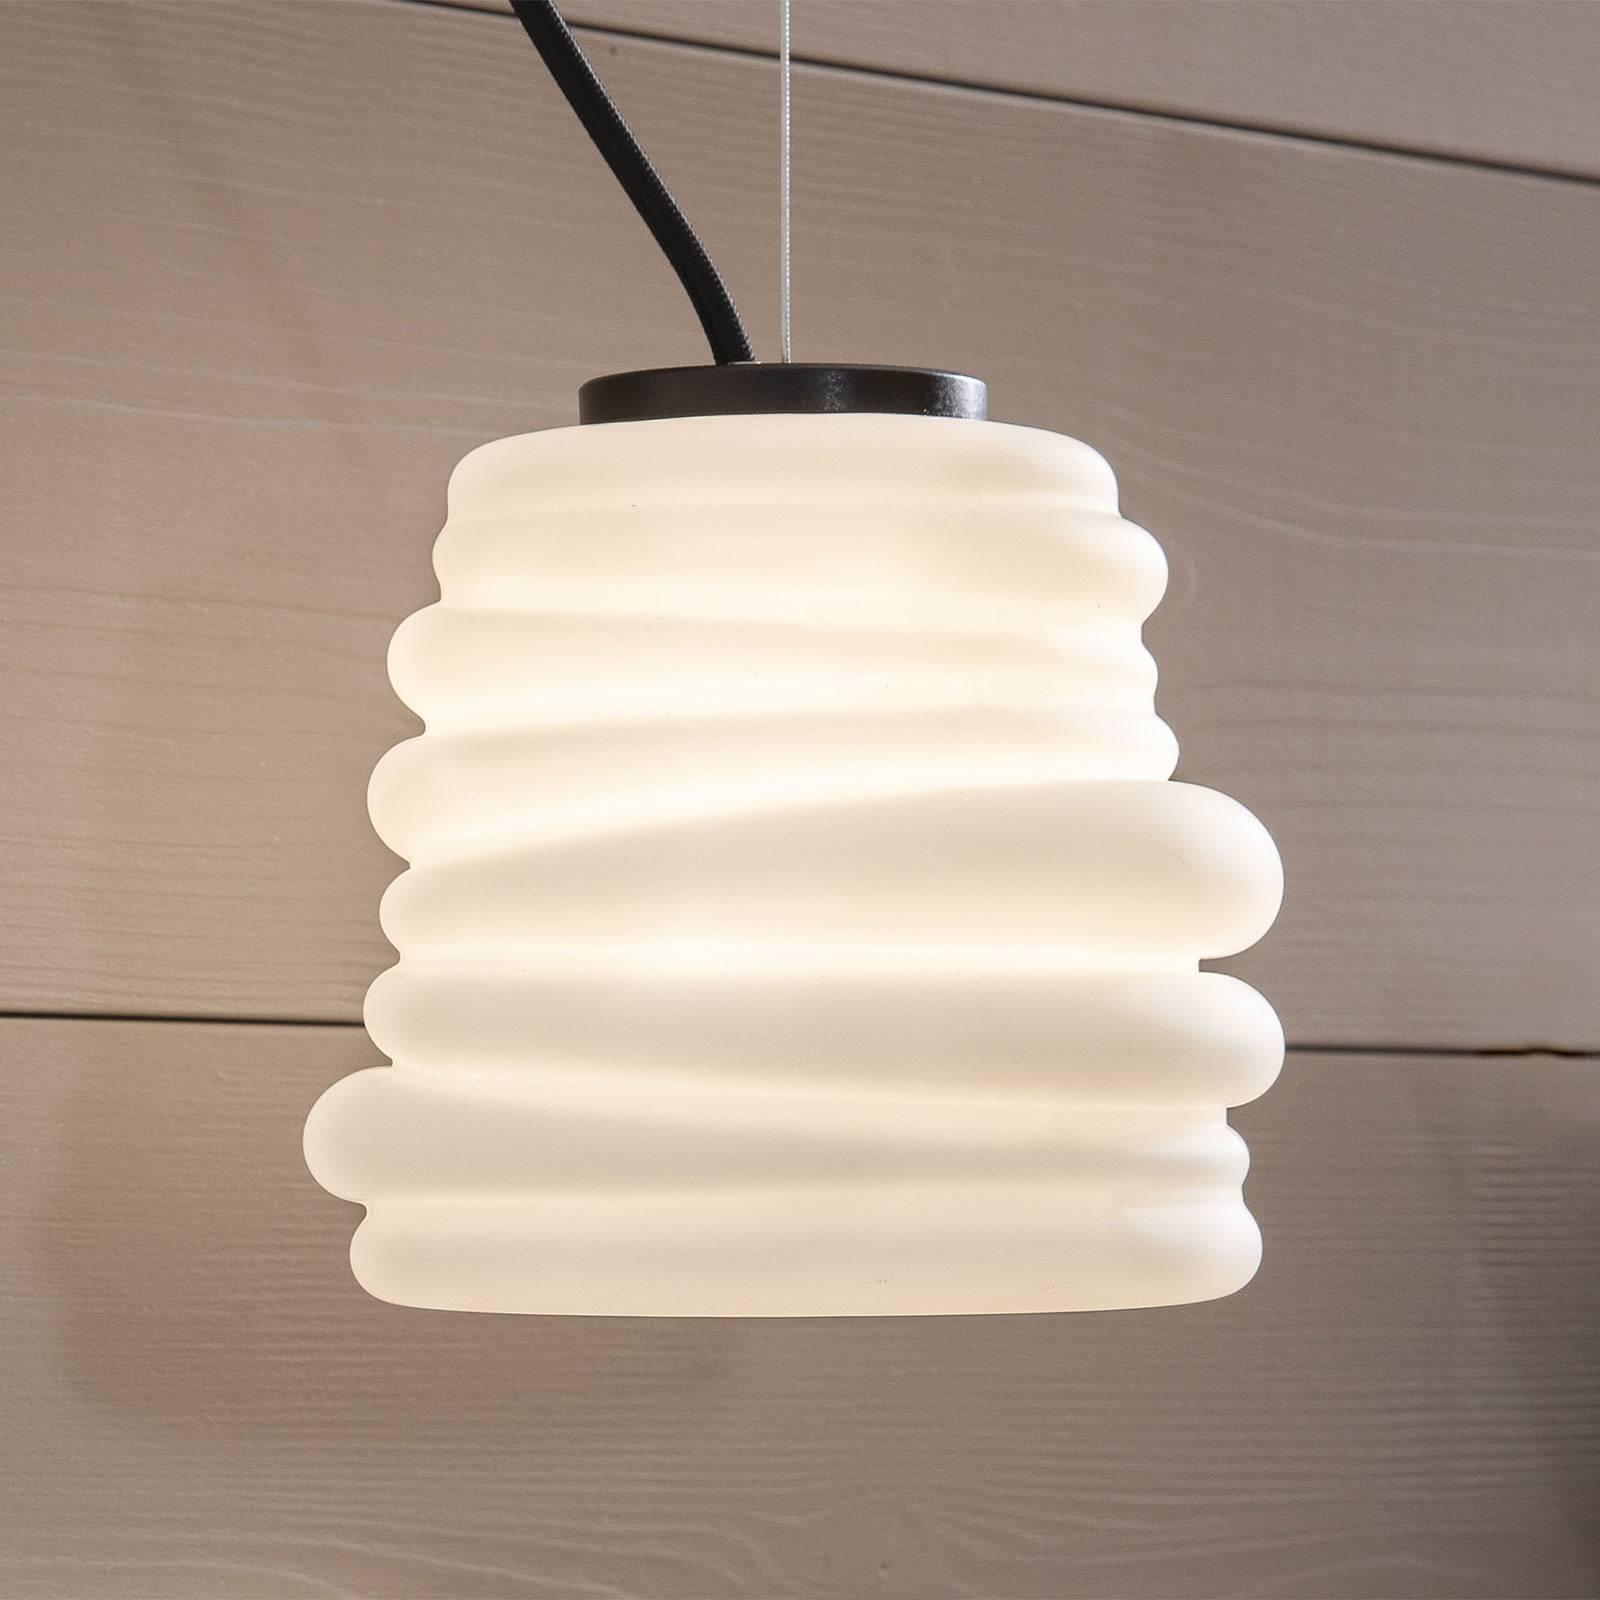 Karman Bibendum LED hanglamp, Ø 15 cm, wit